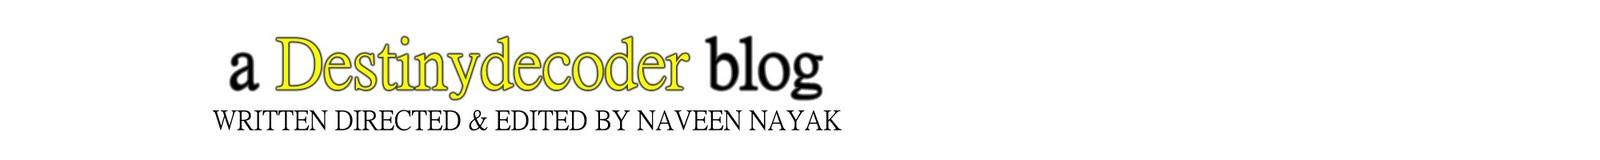 a destinydecoder blog